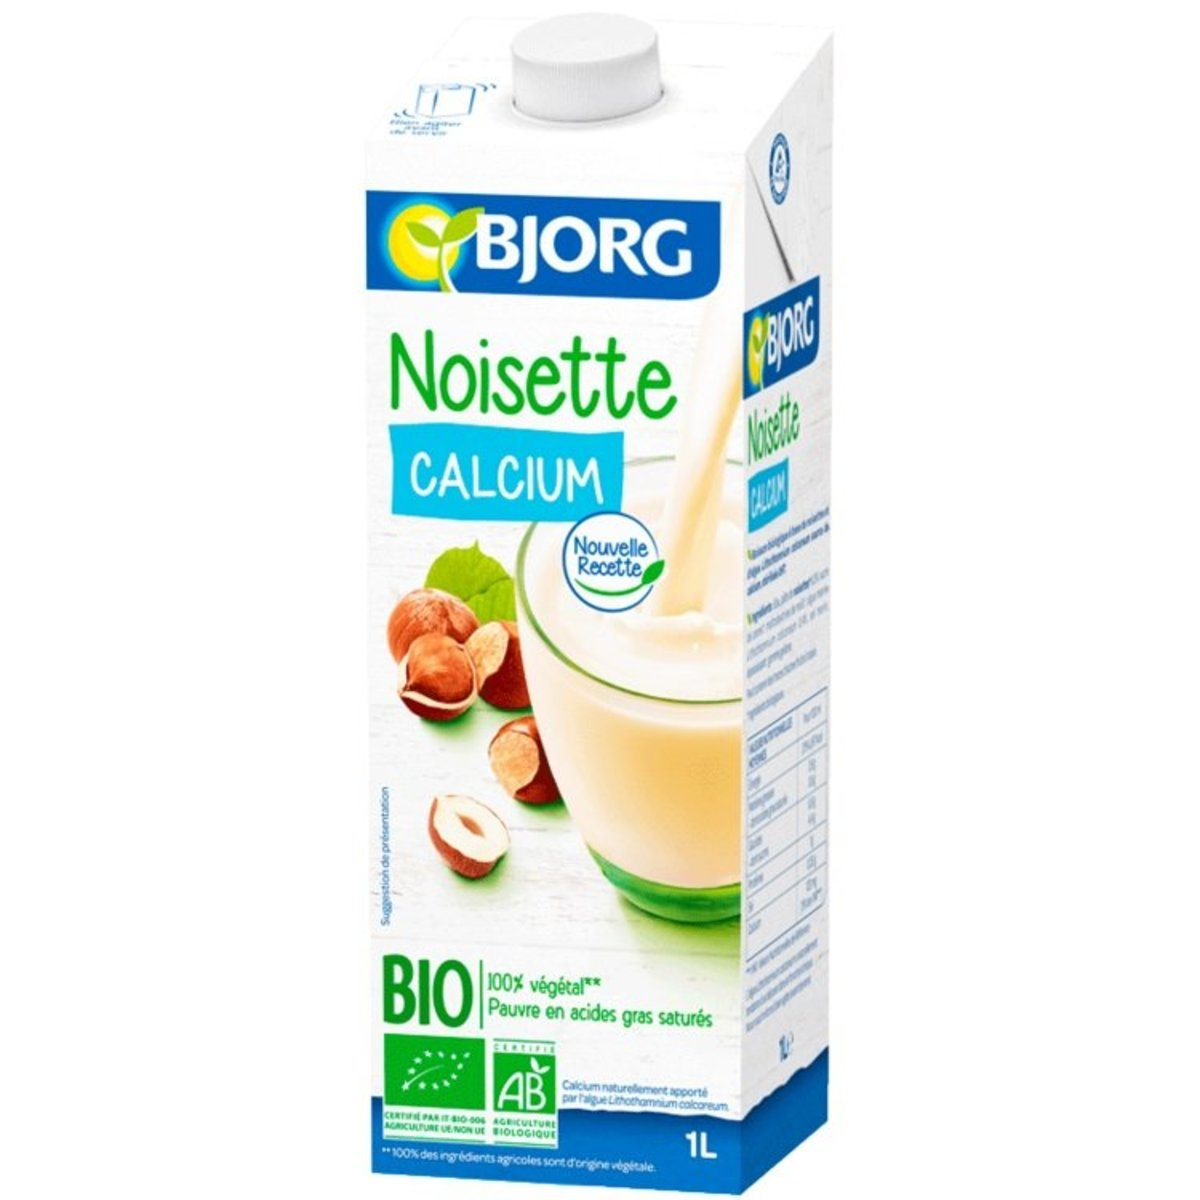 Organic Hazelnut Drink with Calclum(1L)-(1pc)-Italy BJ3015619